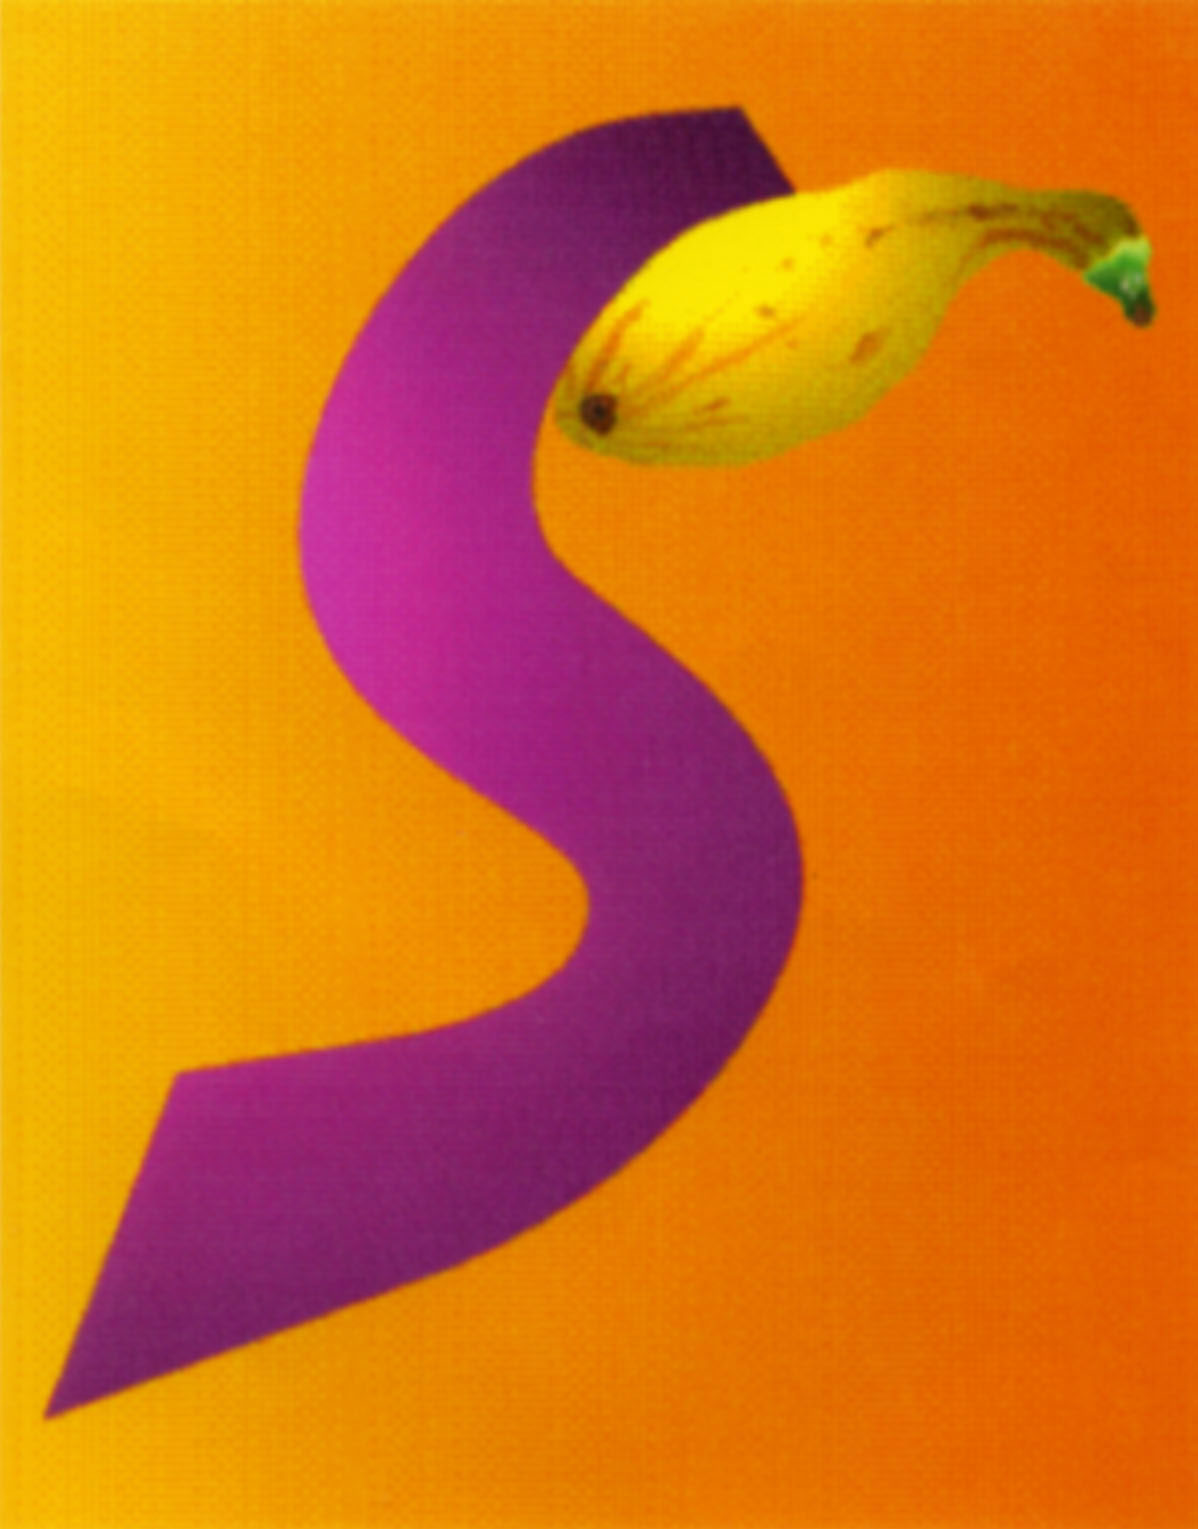 S/Squash.1998  Digital Painting